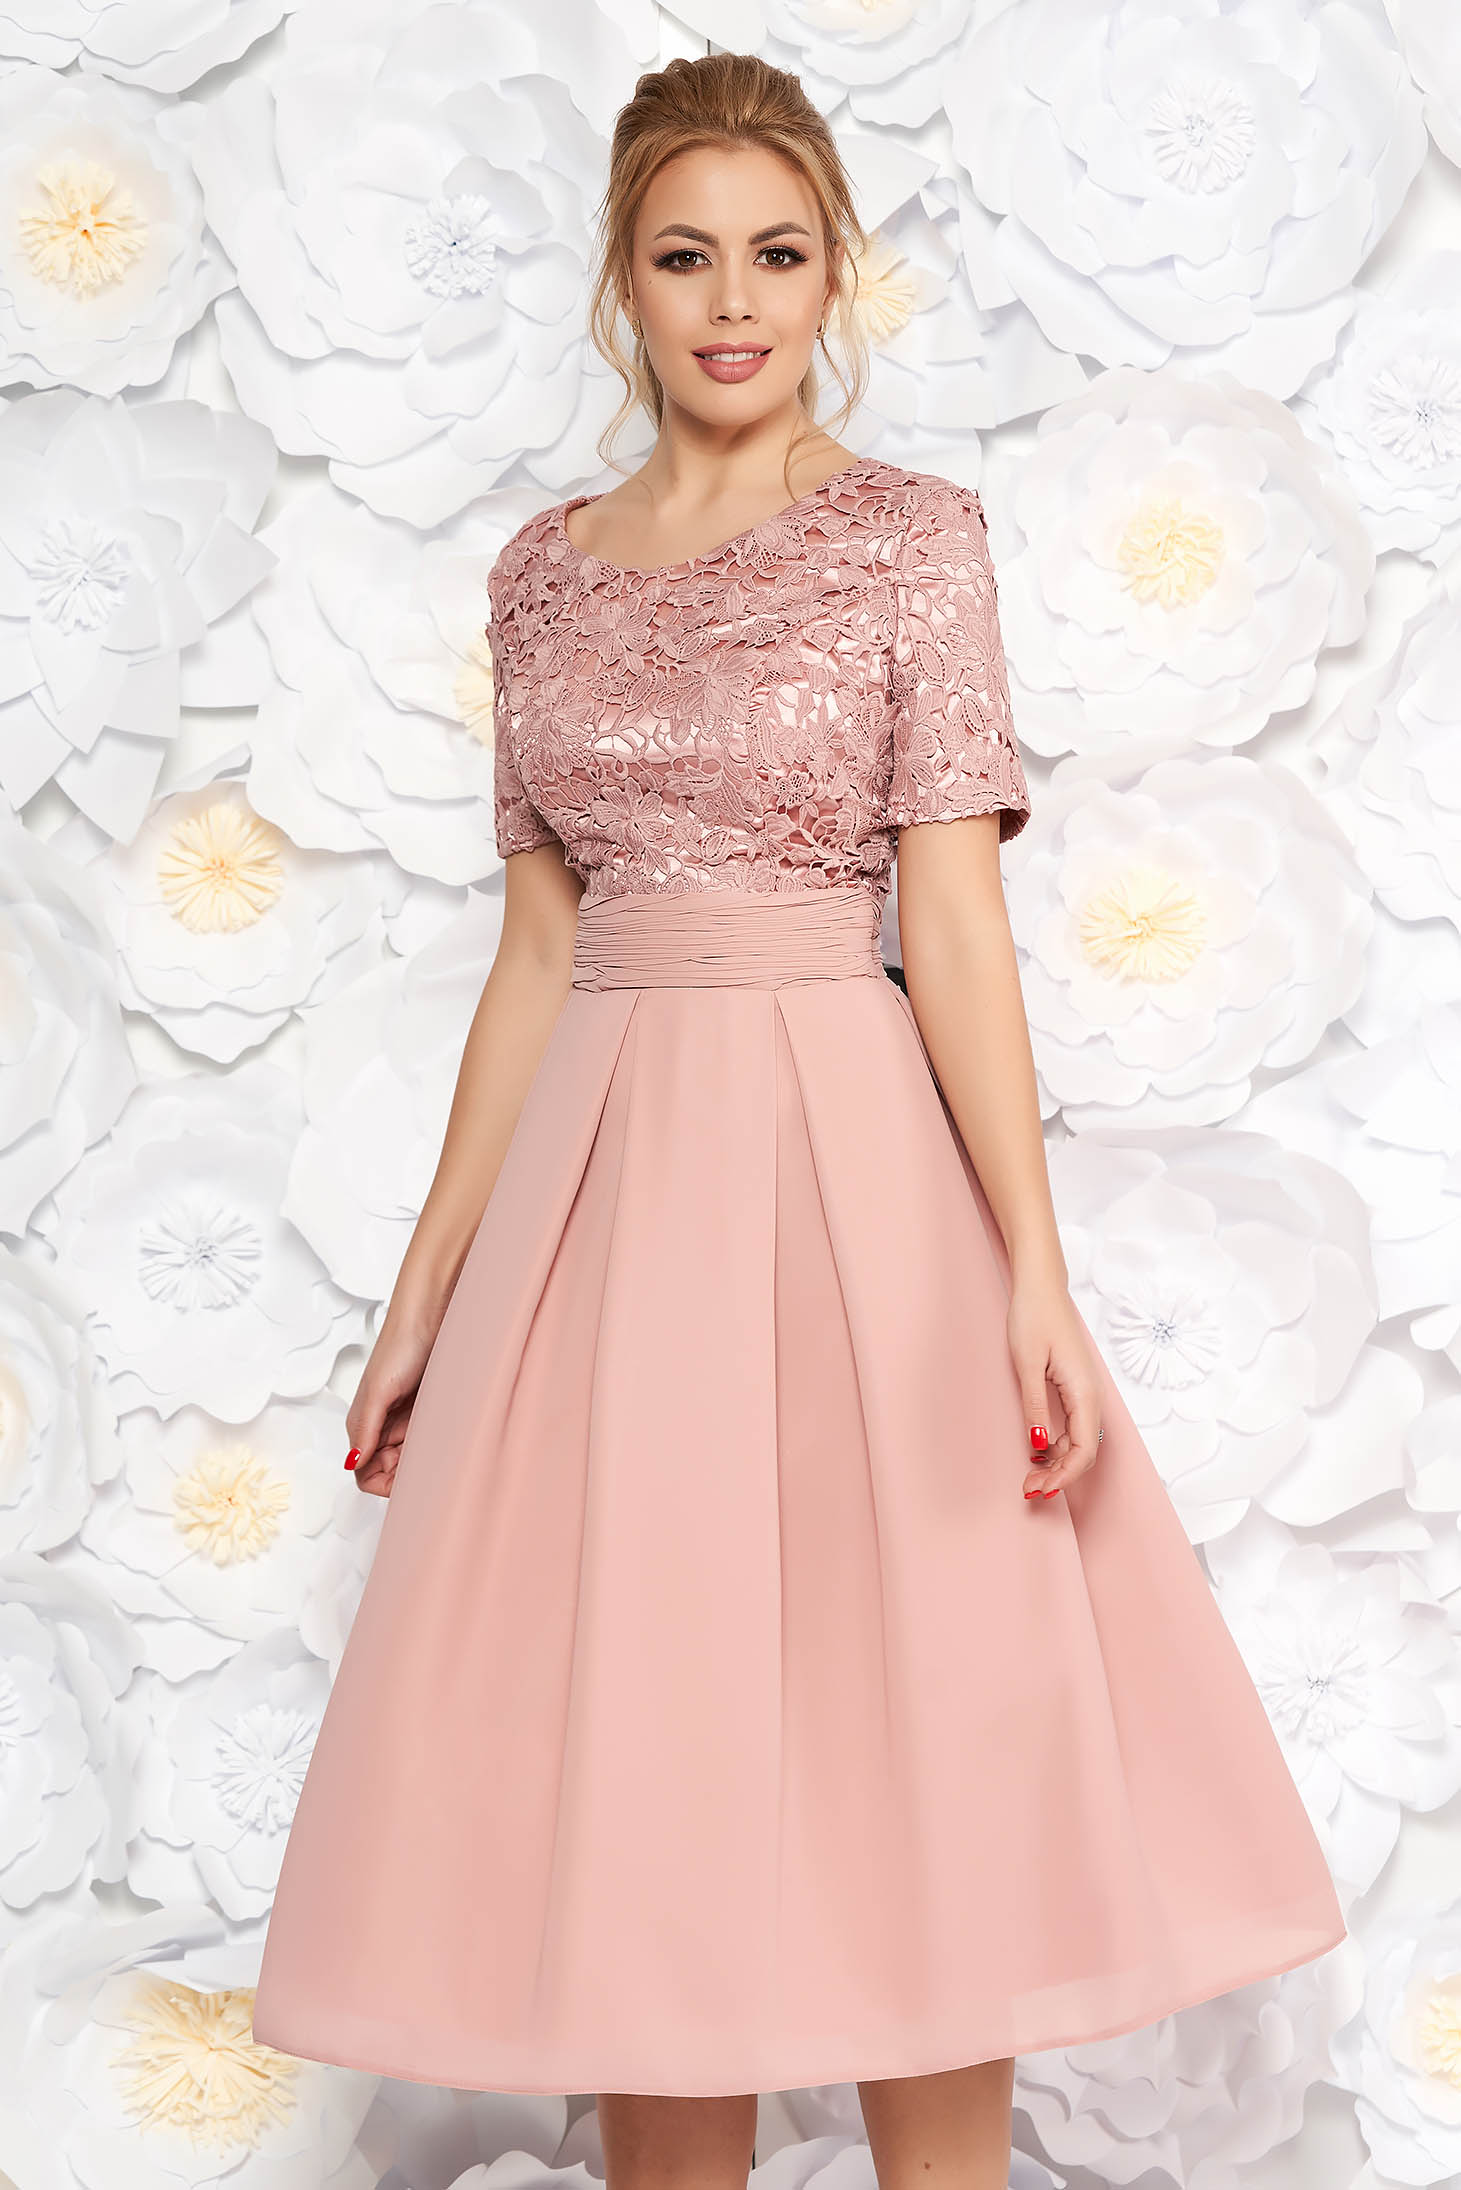 Rochie rosa de ocazie midi in clos din stofa usor elastica si dantela captusita pe interior cu spatele decupat